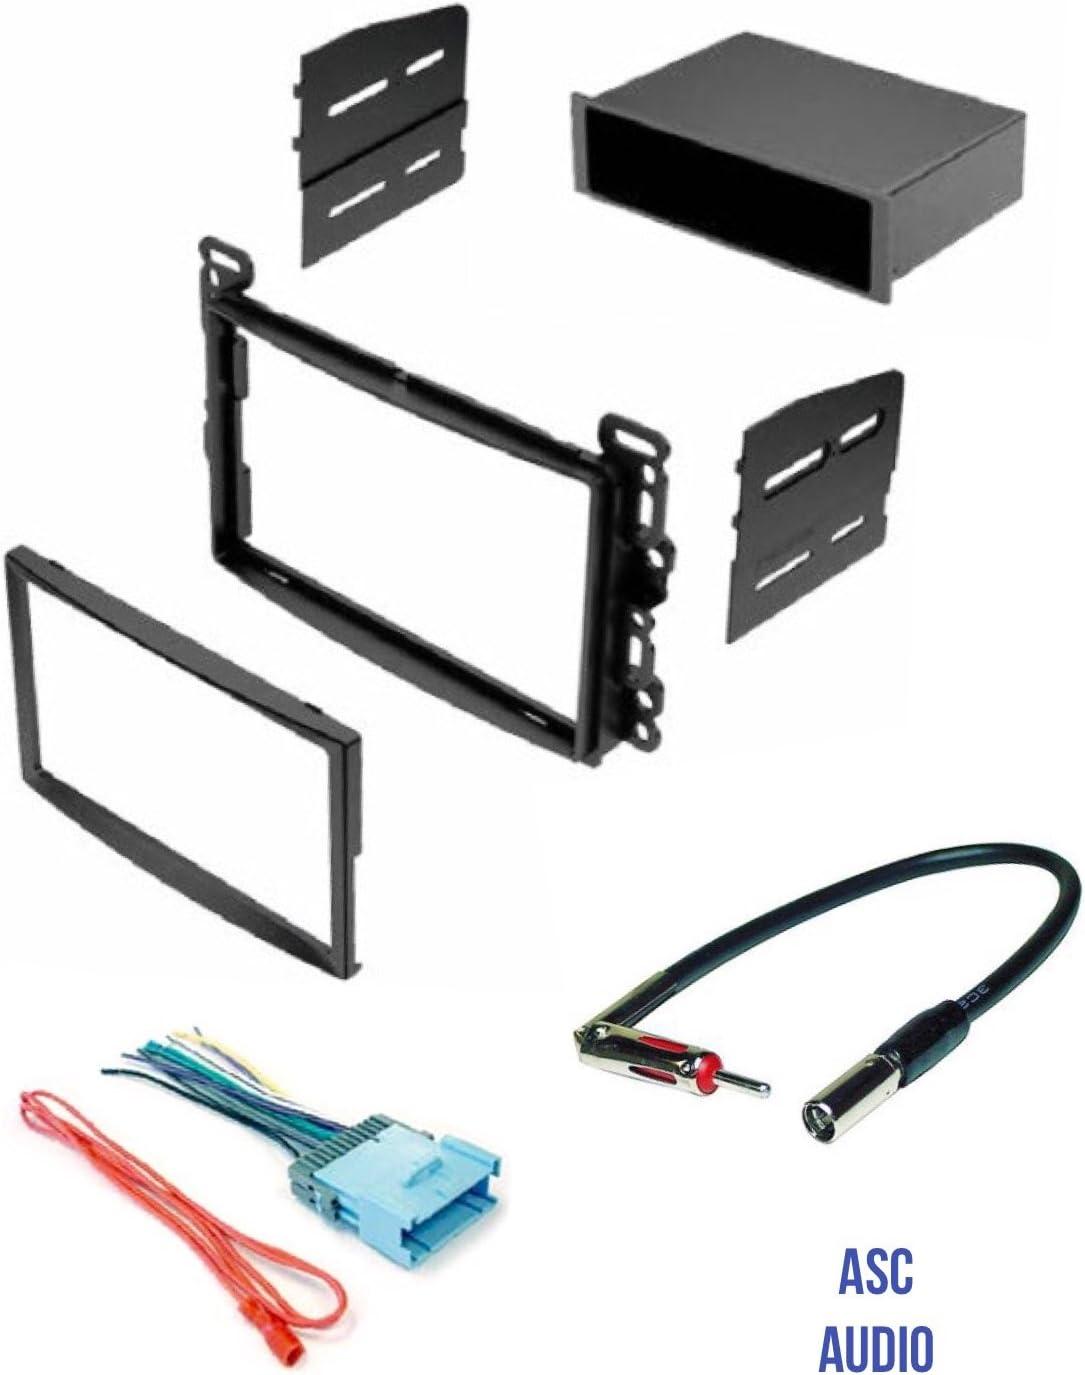 T1 Audio Universal Double Din to Single DIN Car Stereo Pocket Tray Facia Adaptor